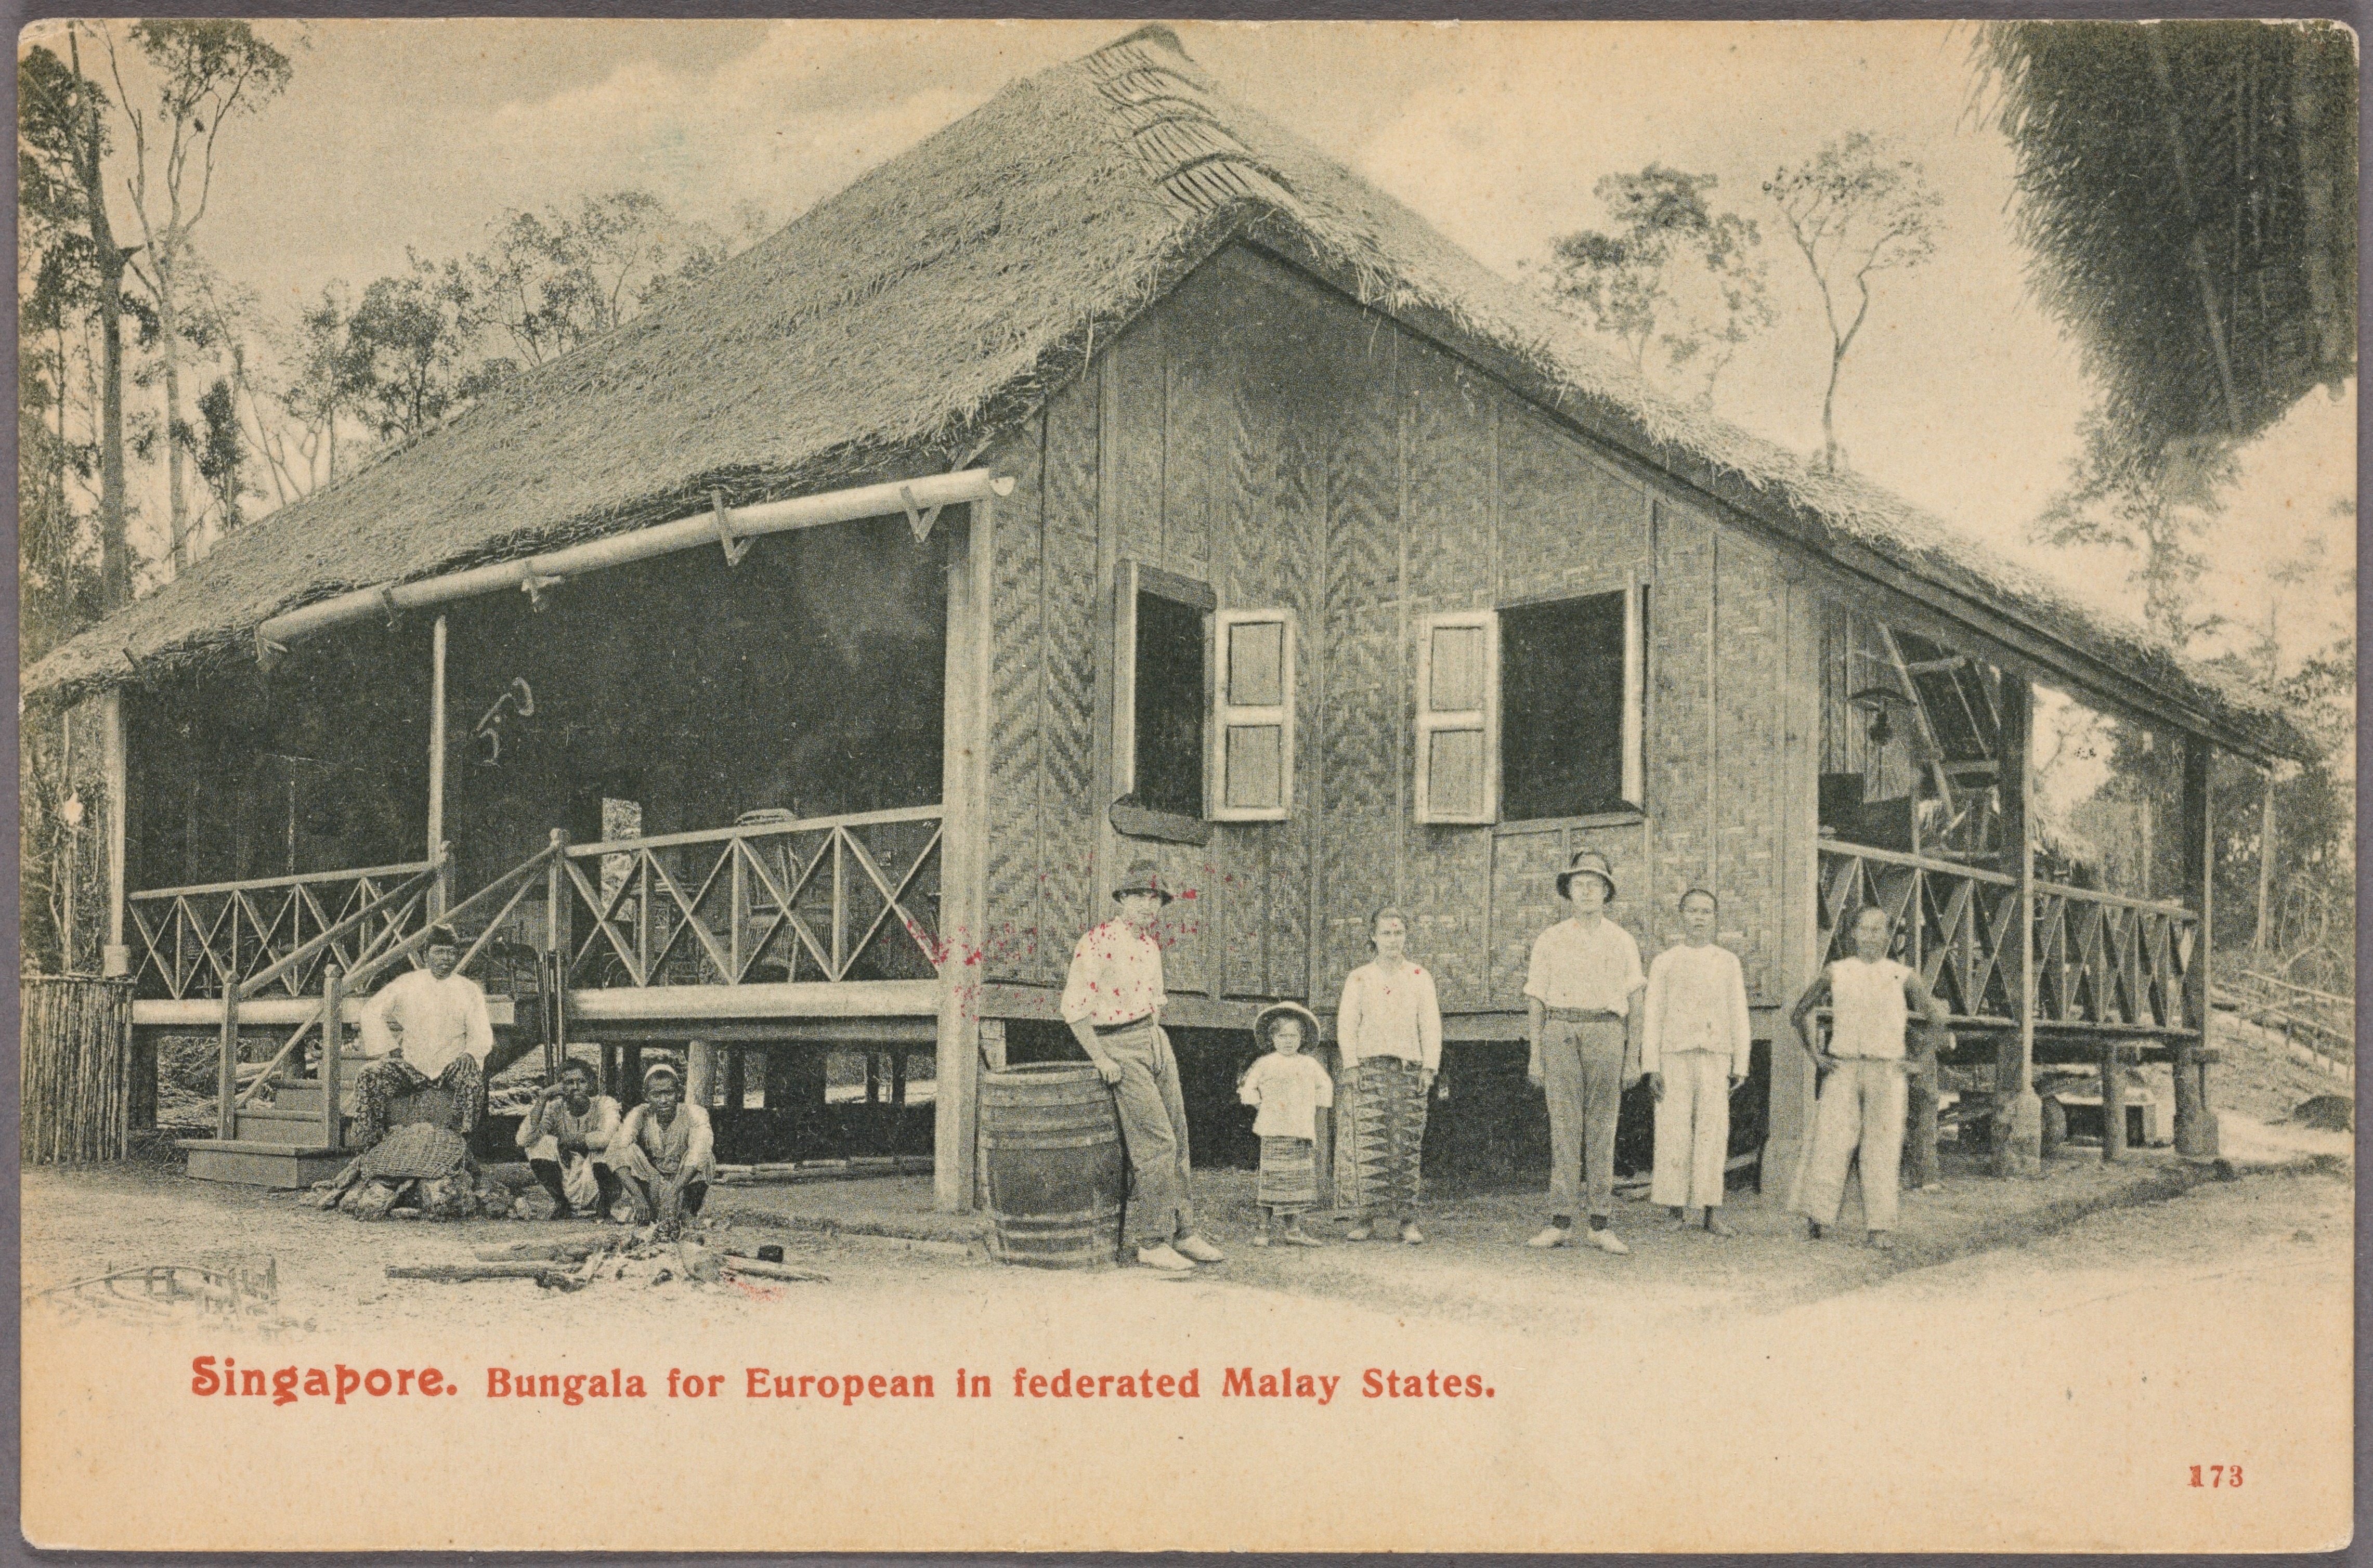 filesingapore bungala for european in federated malay states